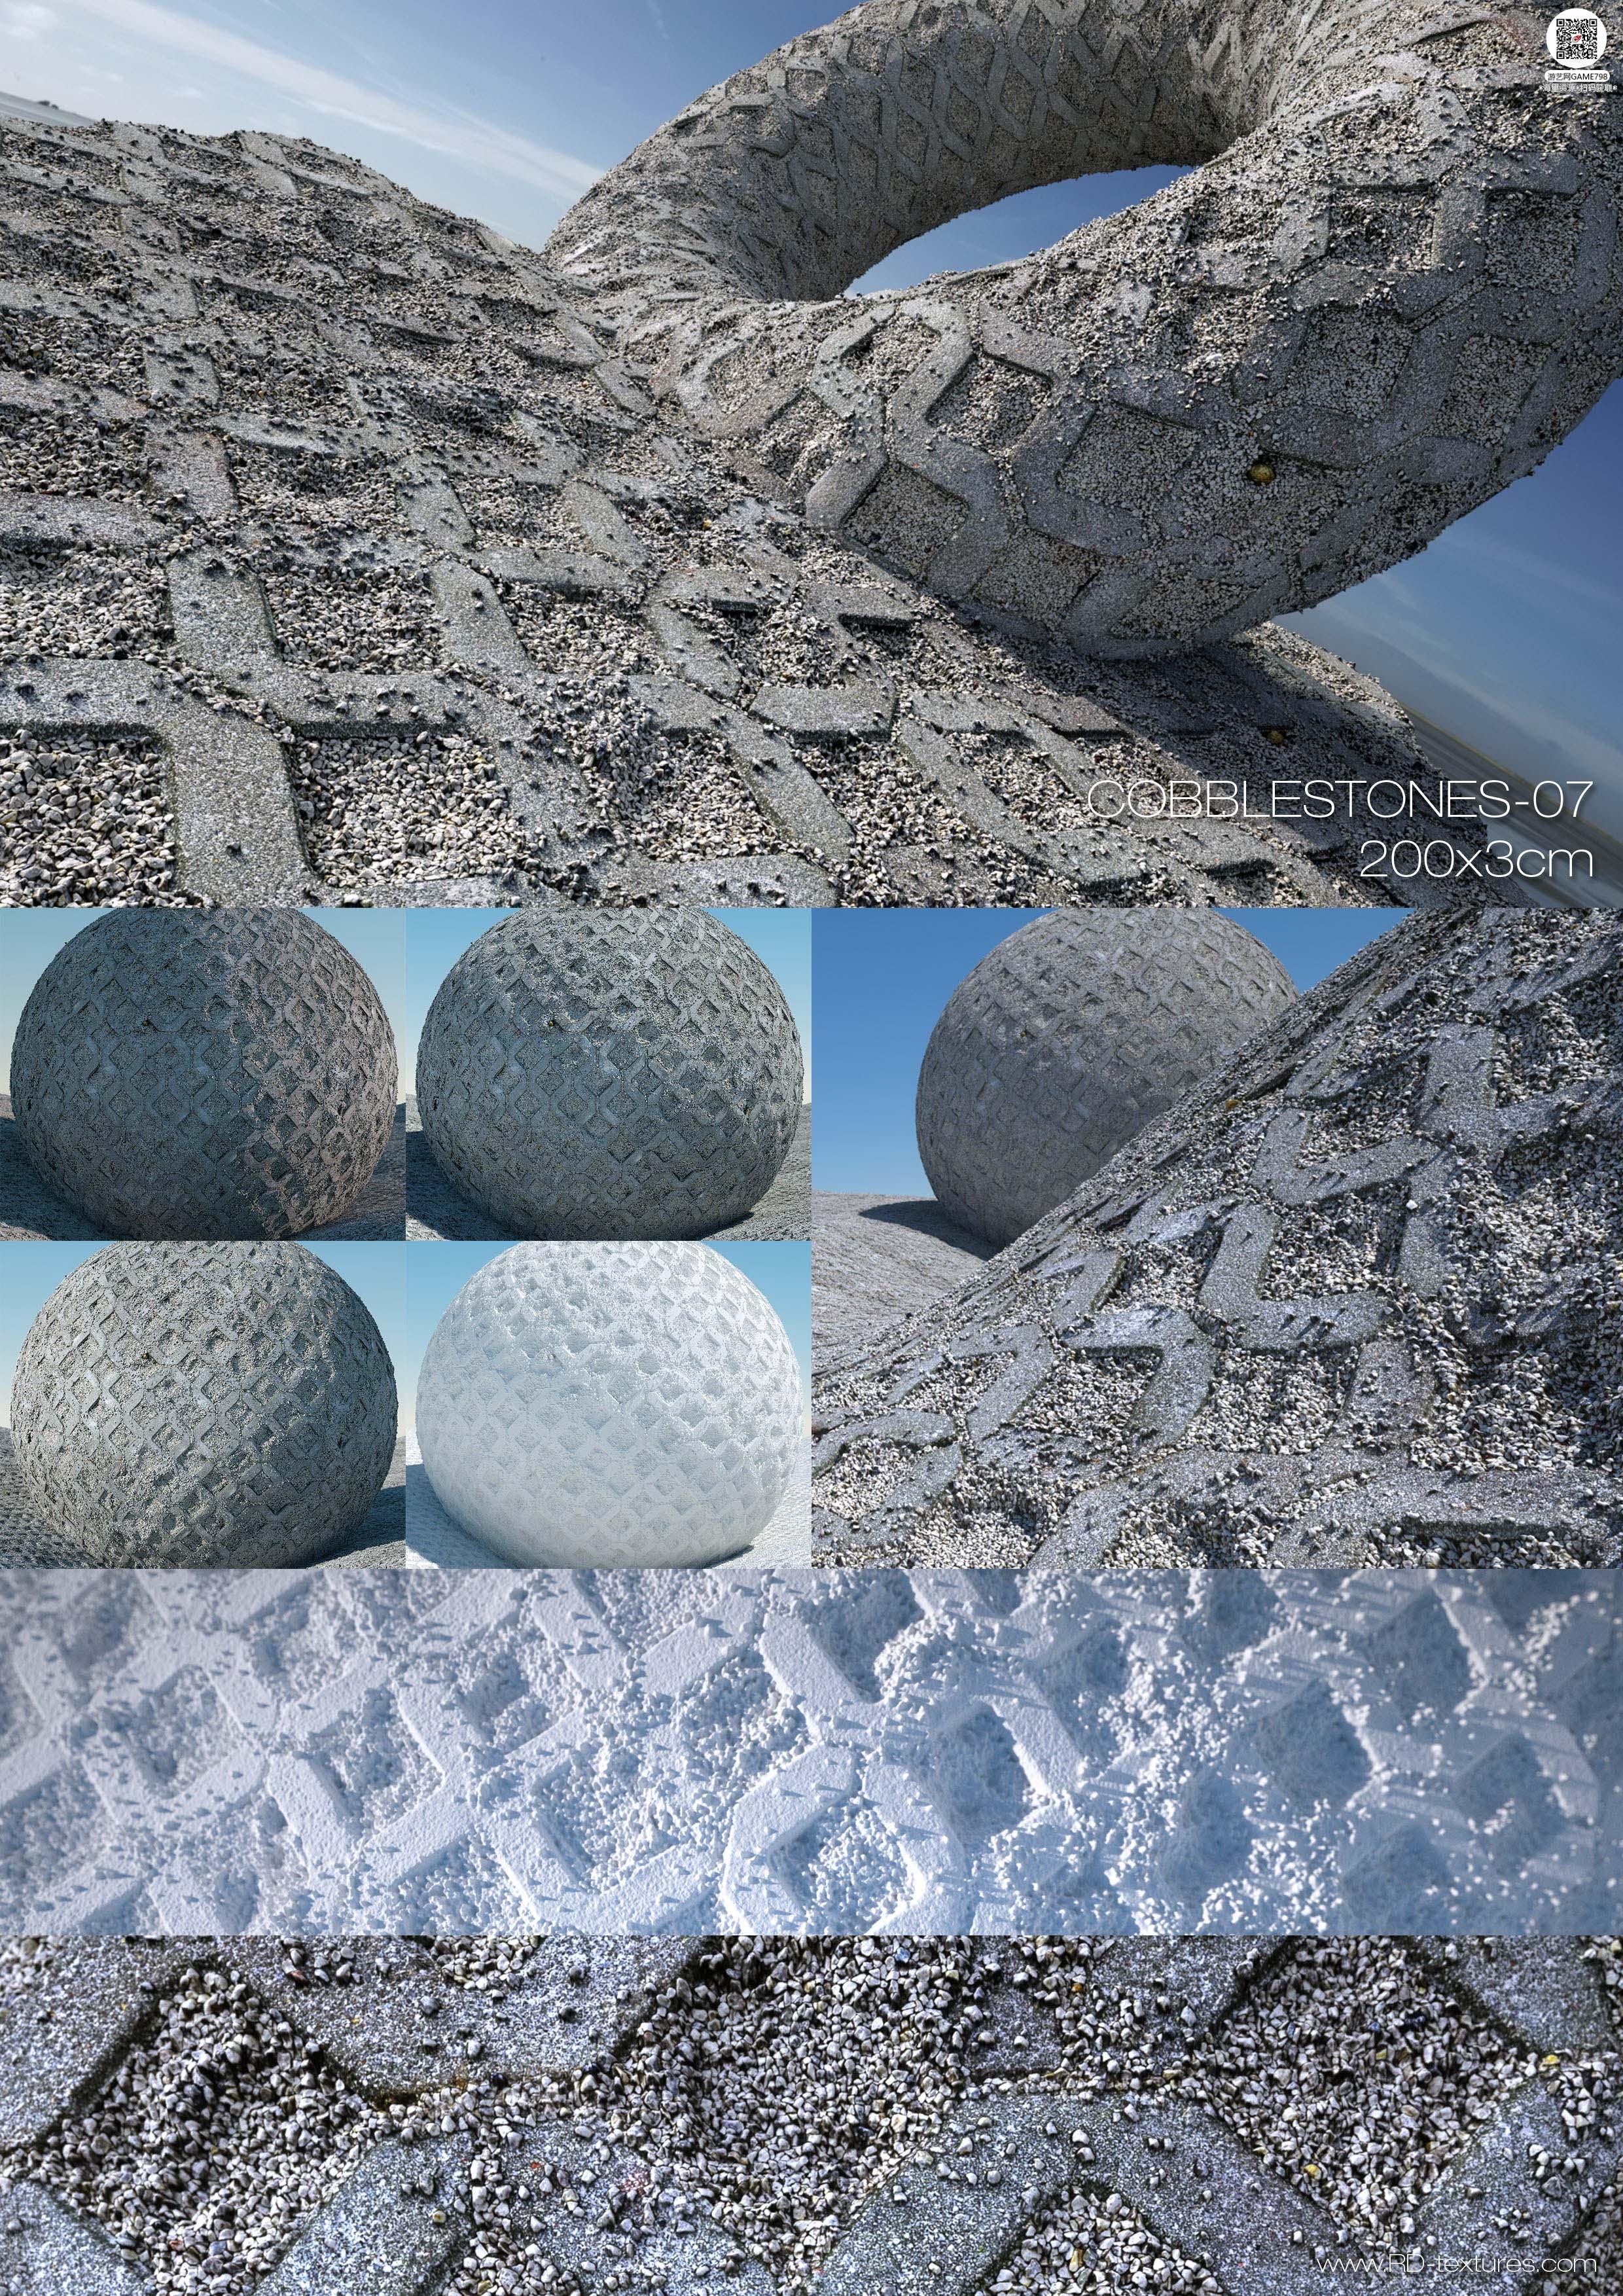 COBBLESTONES-07_200x3cm.jpg